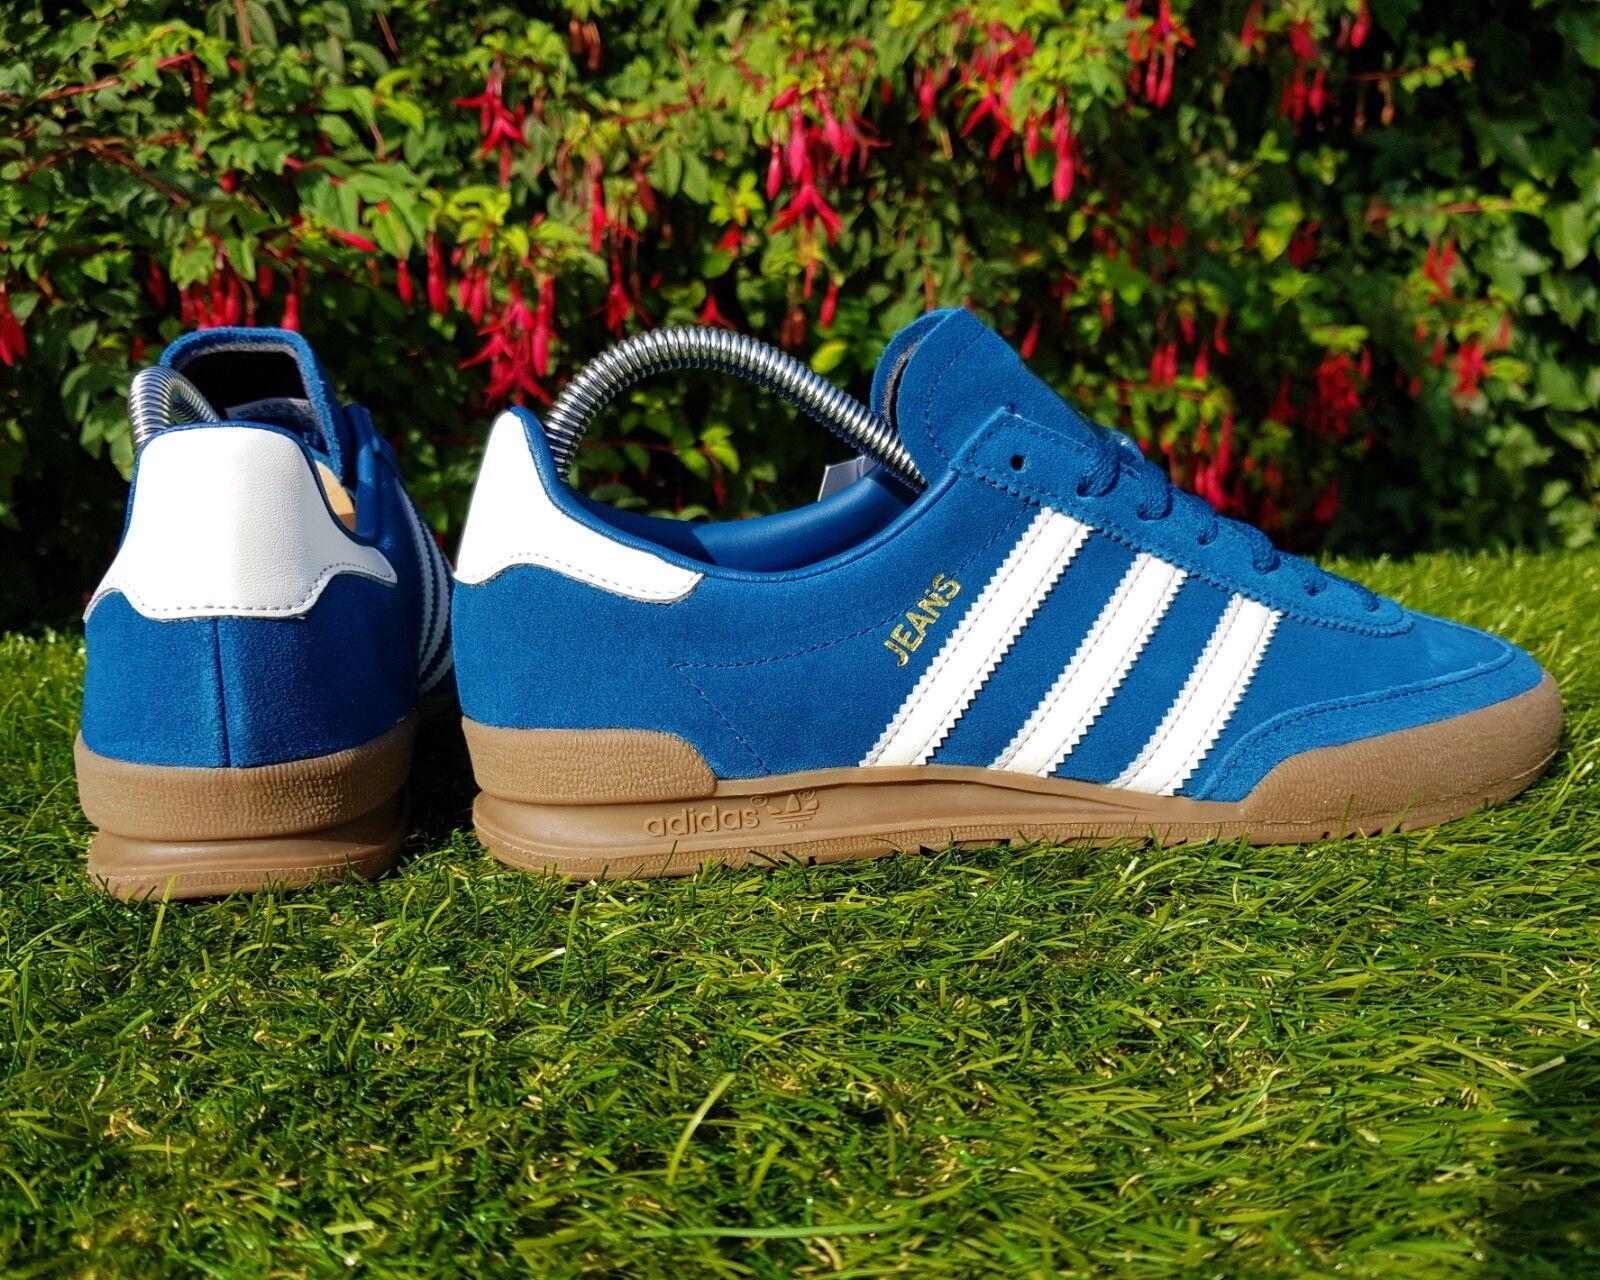 BNWB & Genuine adidas originals Jeans MkII Mk2 bluee Suede Trainers UK Size 10